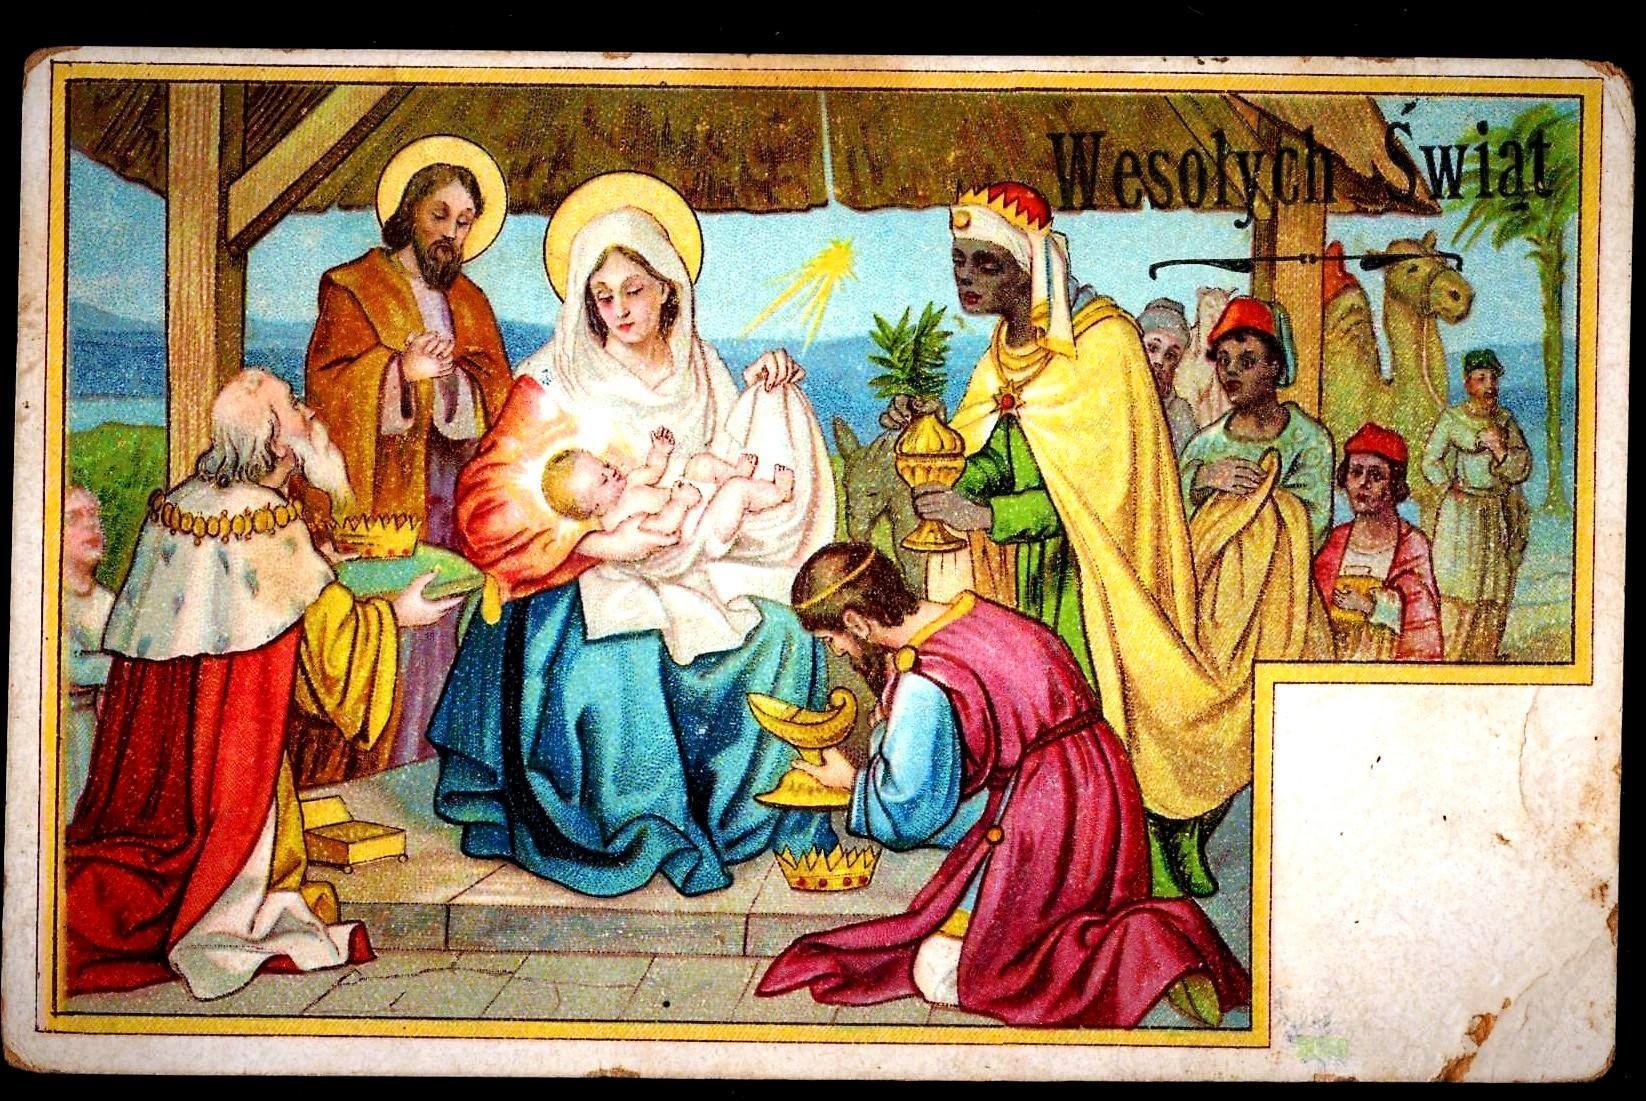 C1910 Religious Christmas Nativity Vintage Postcard Baby